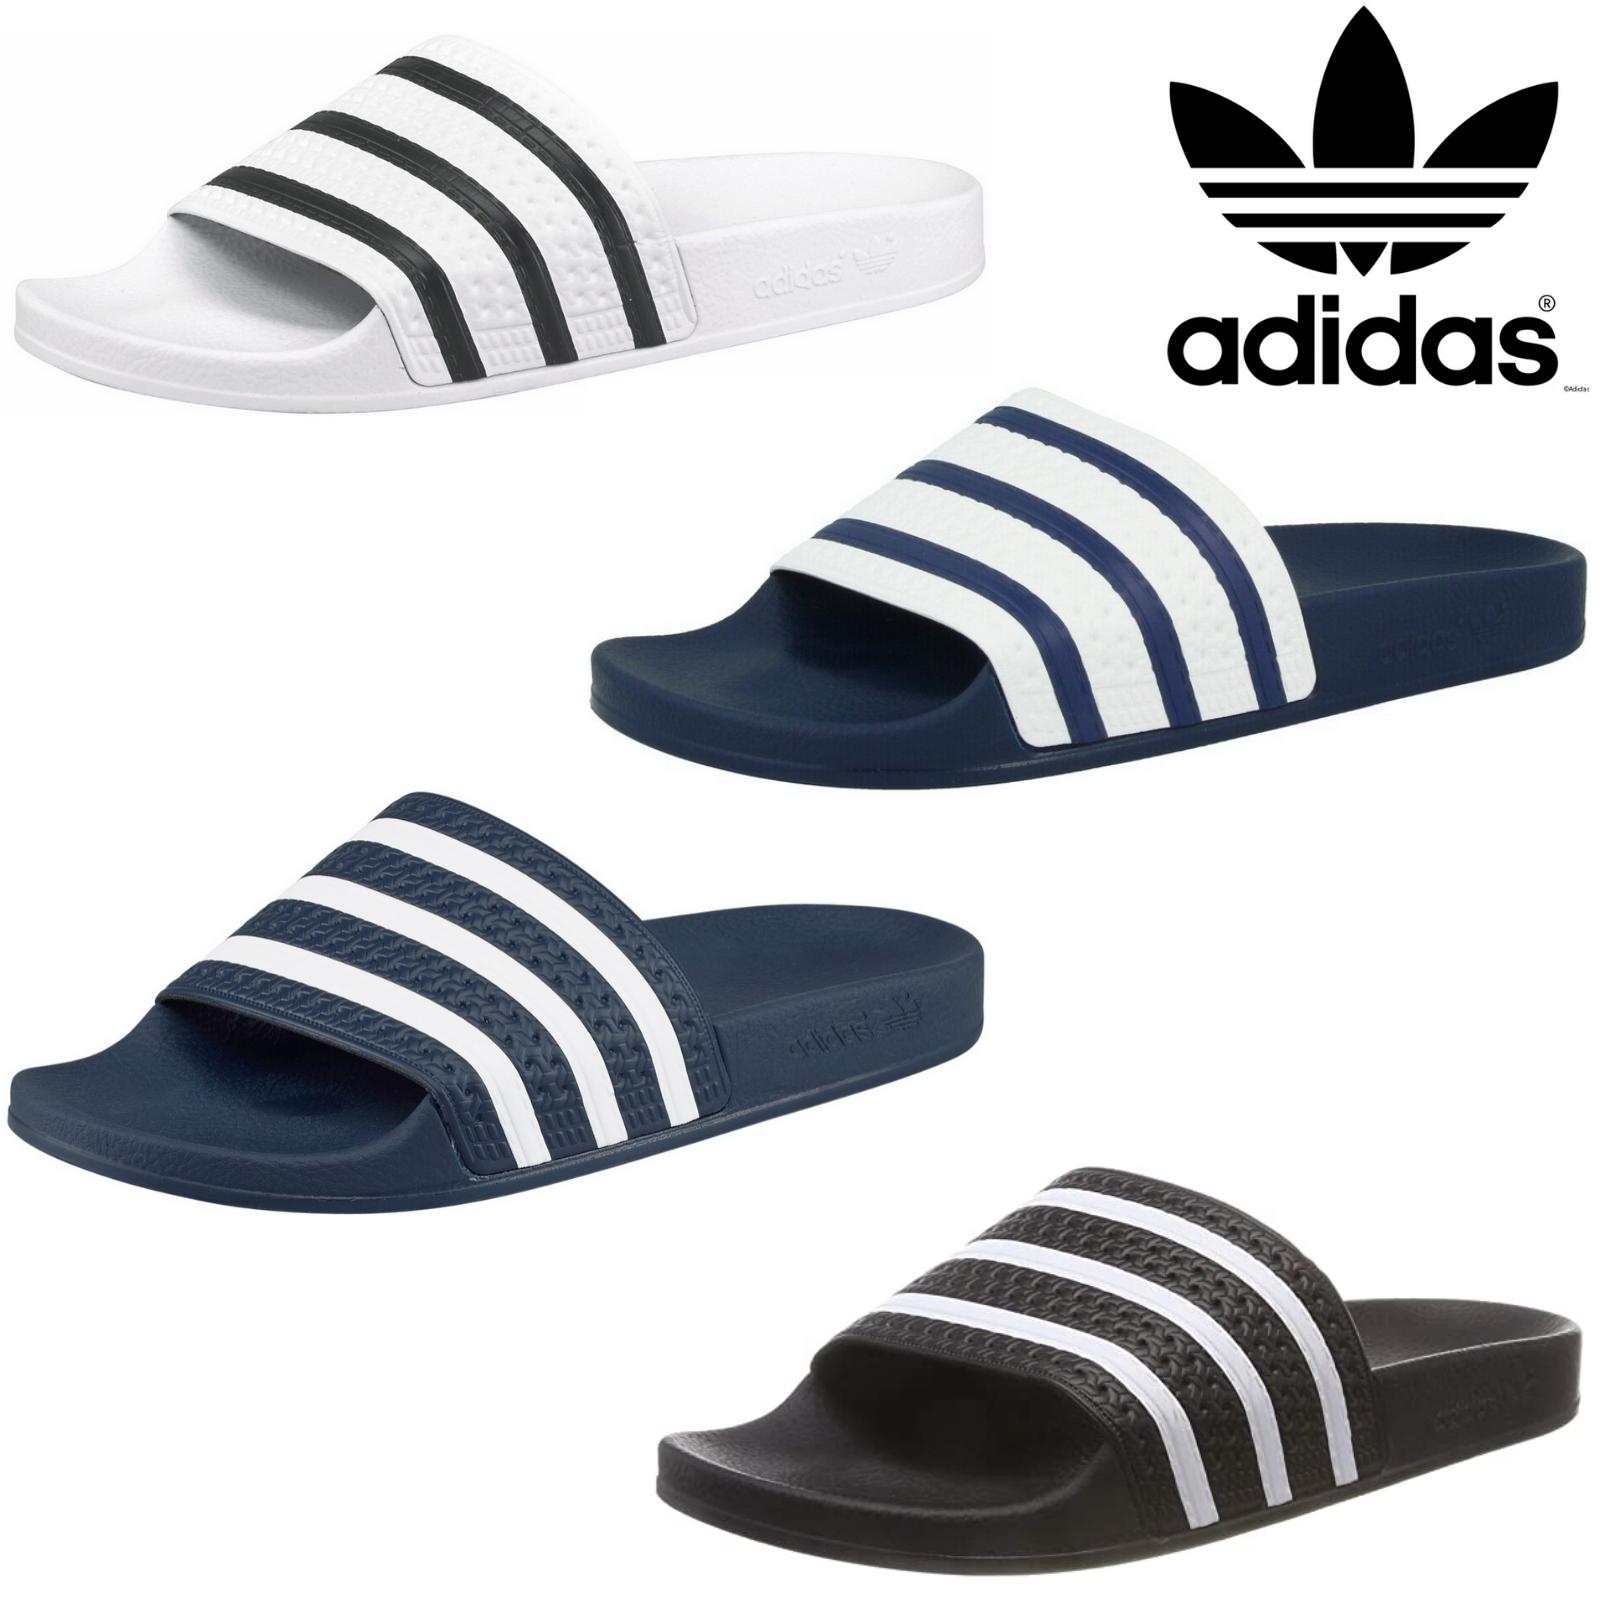 Details zu Adidas Adilette Herren Schuhe Badeschuhe Sandale Badelatschen Pantoletten